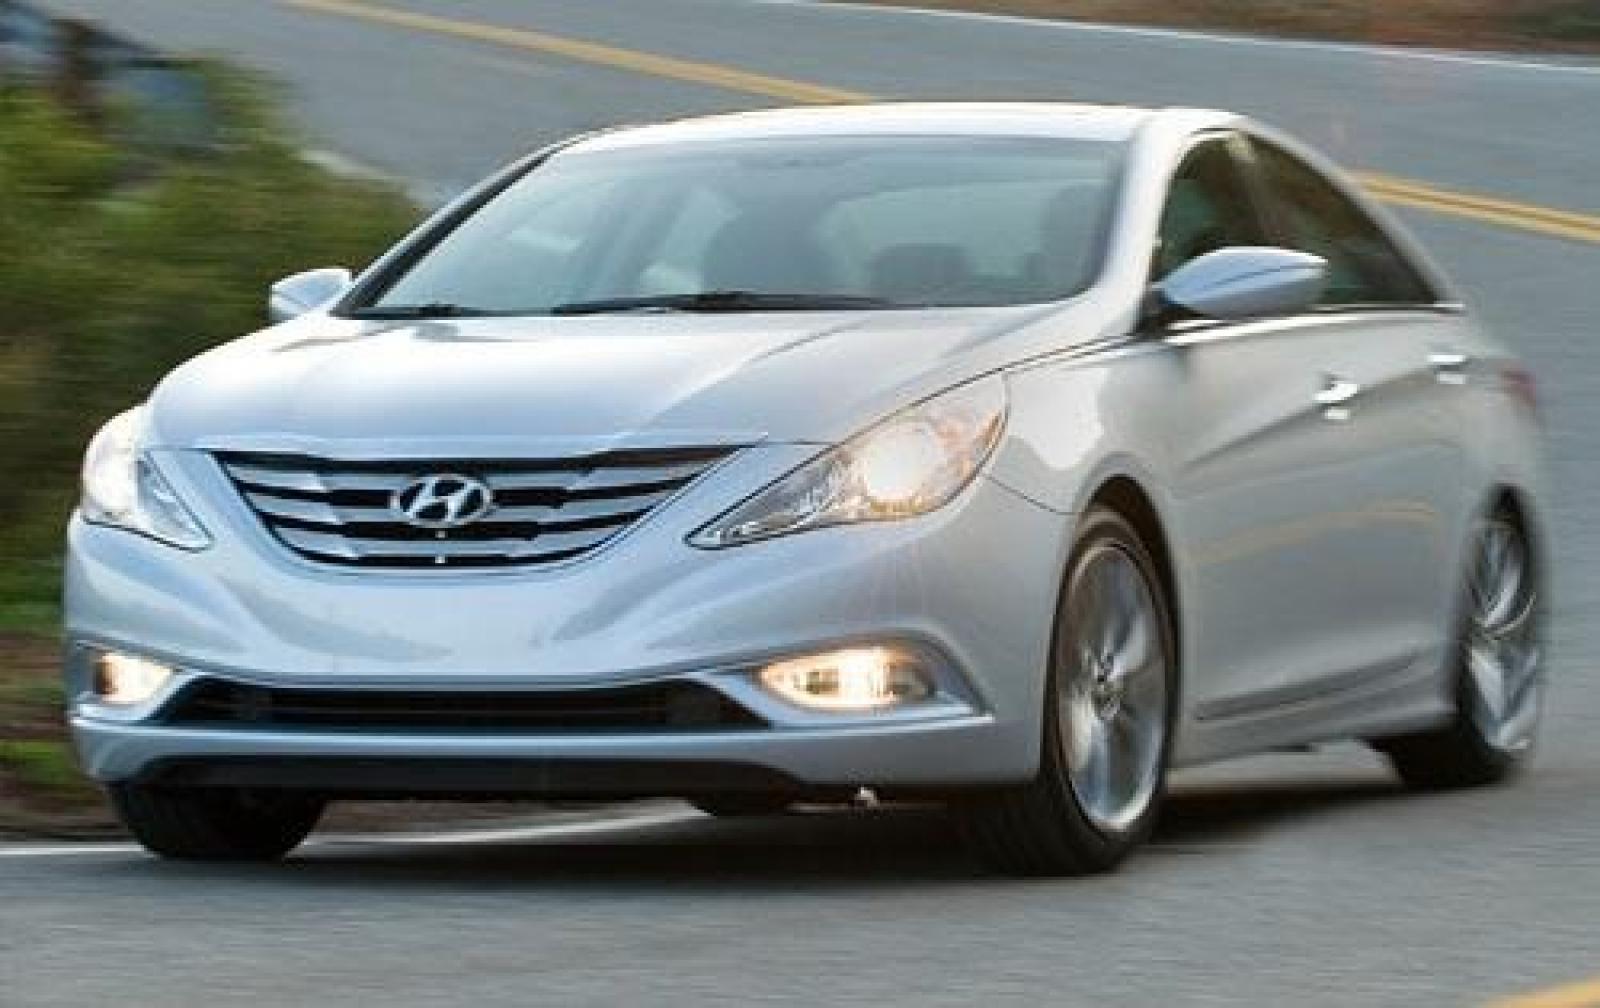 800 1024 1280 1600 Origin 2012 Hyundai Sonata ...